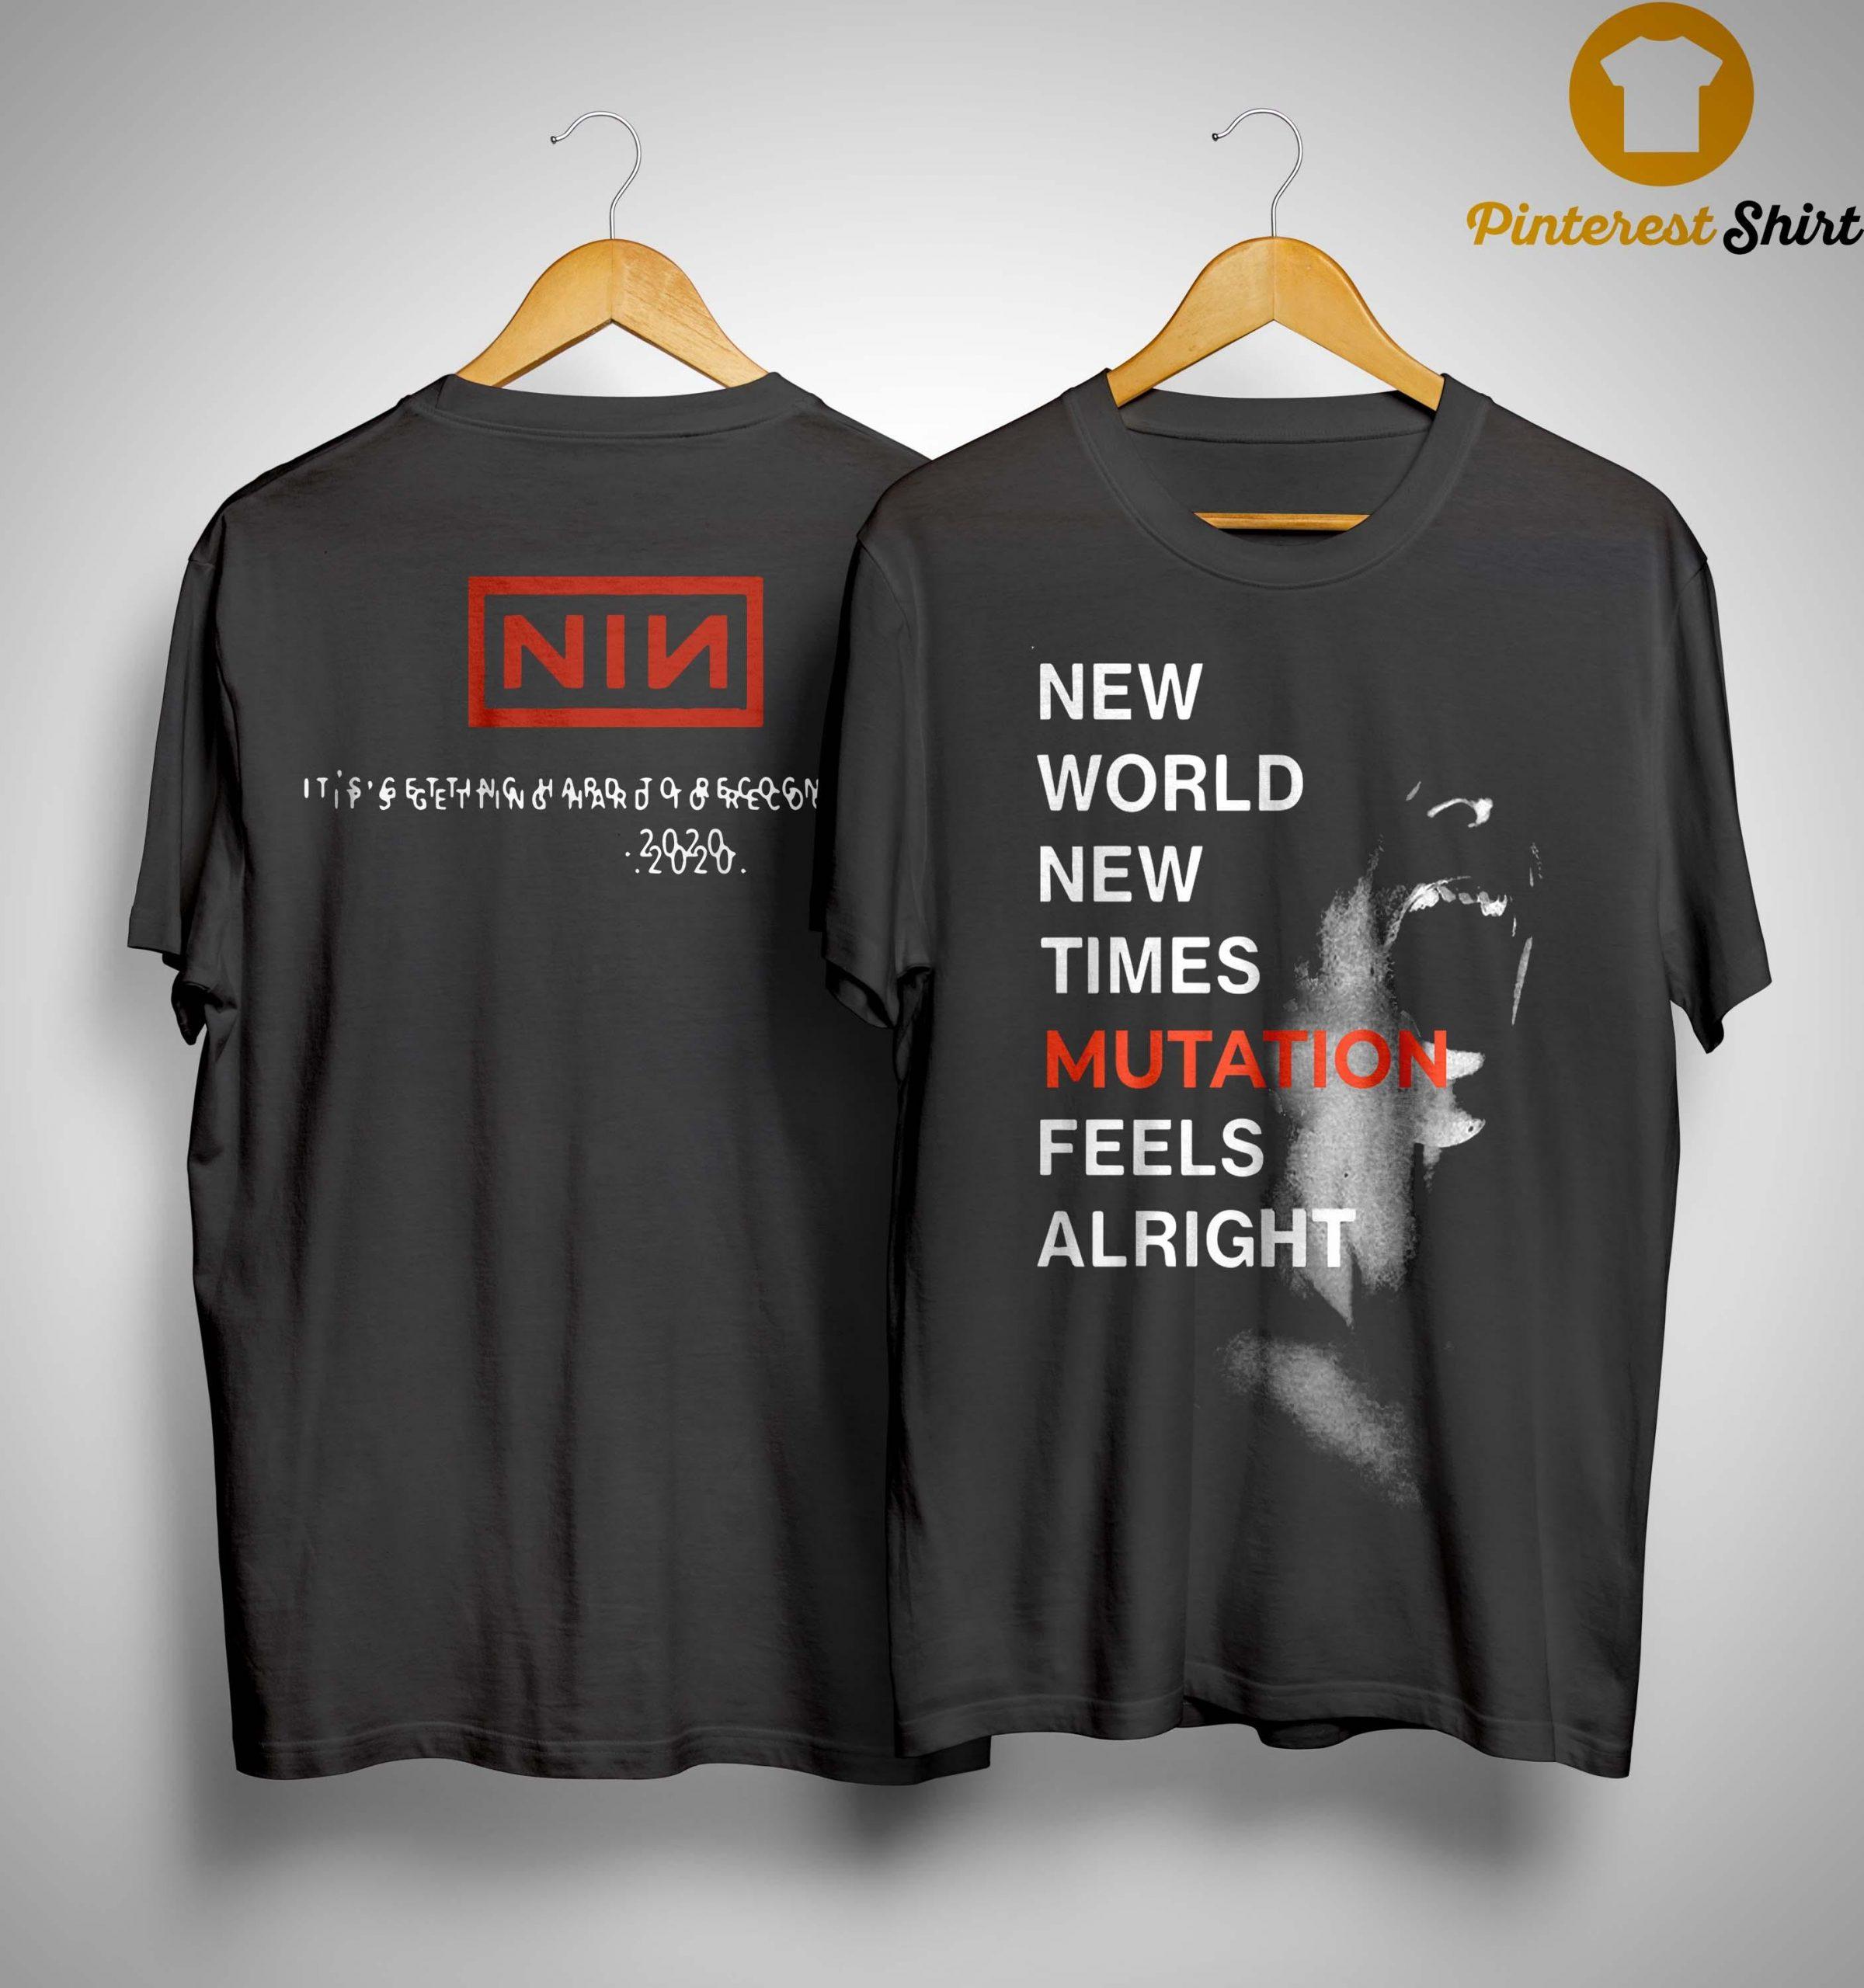 Nine Inch Nails New World New Times Mutation Feels Alright Shirt